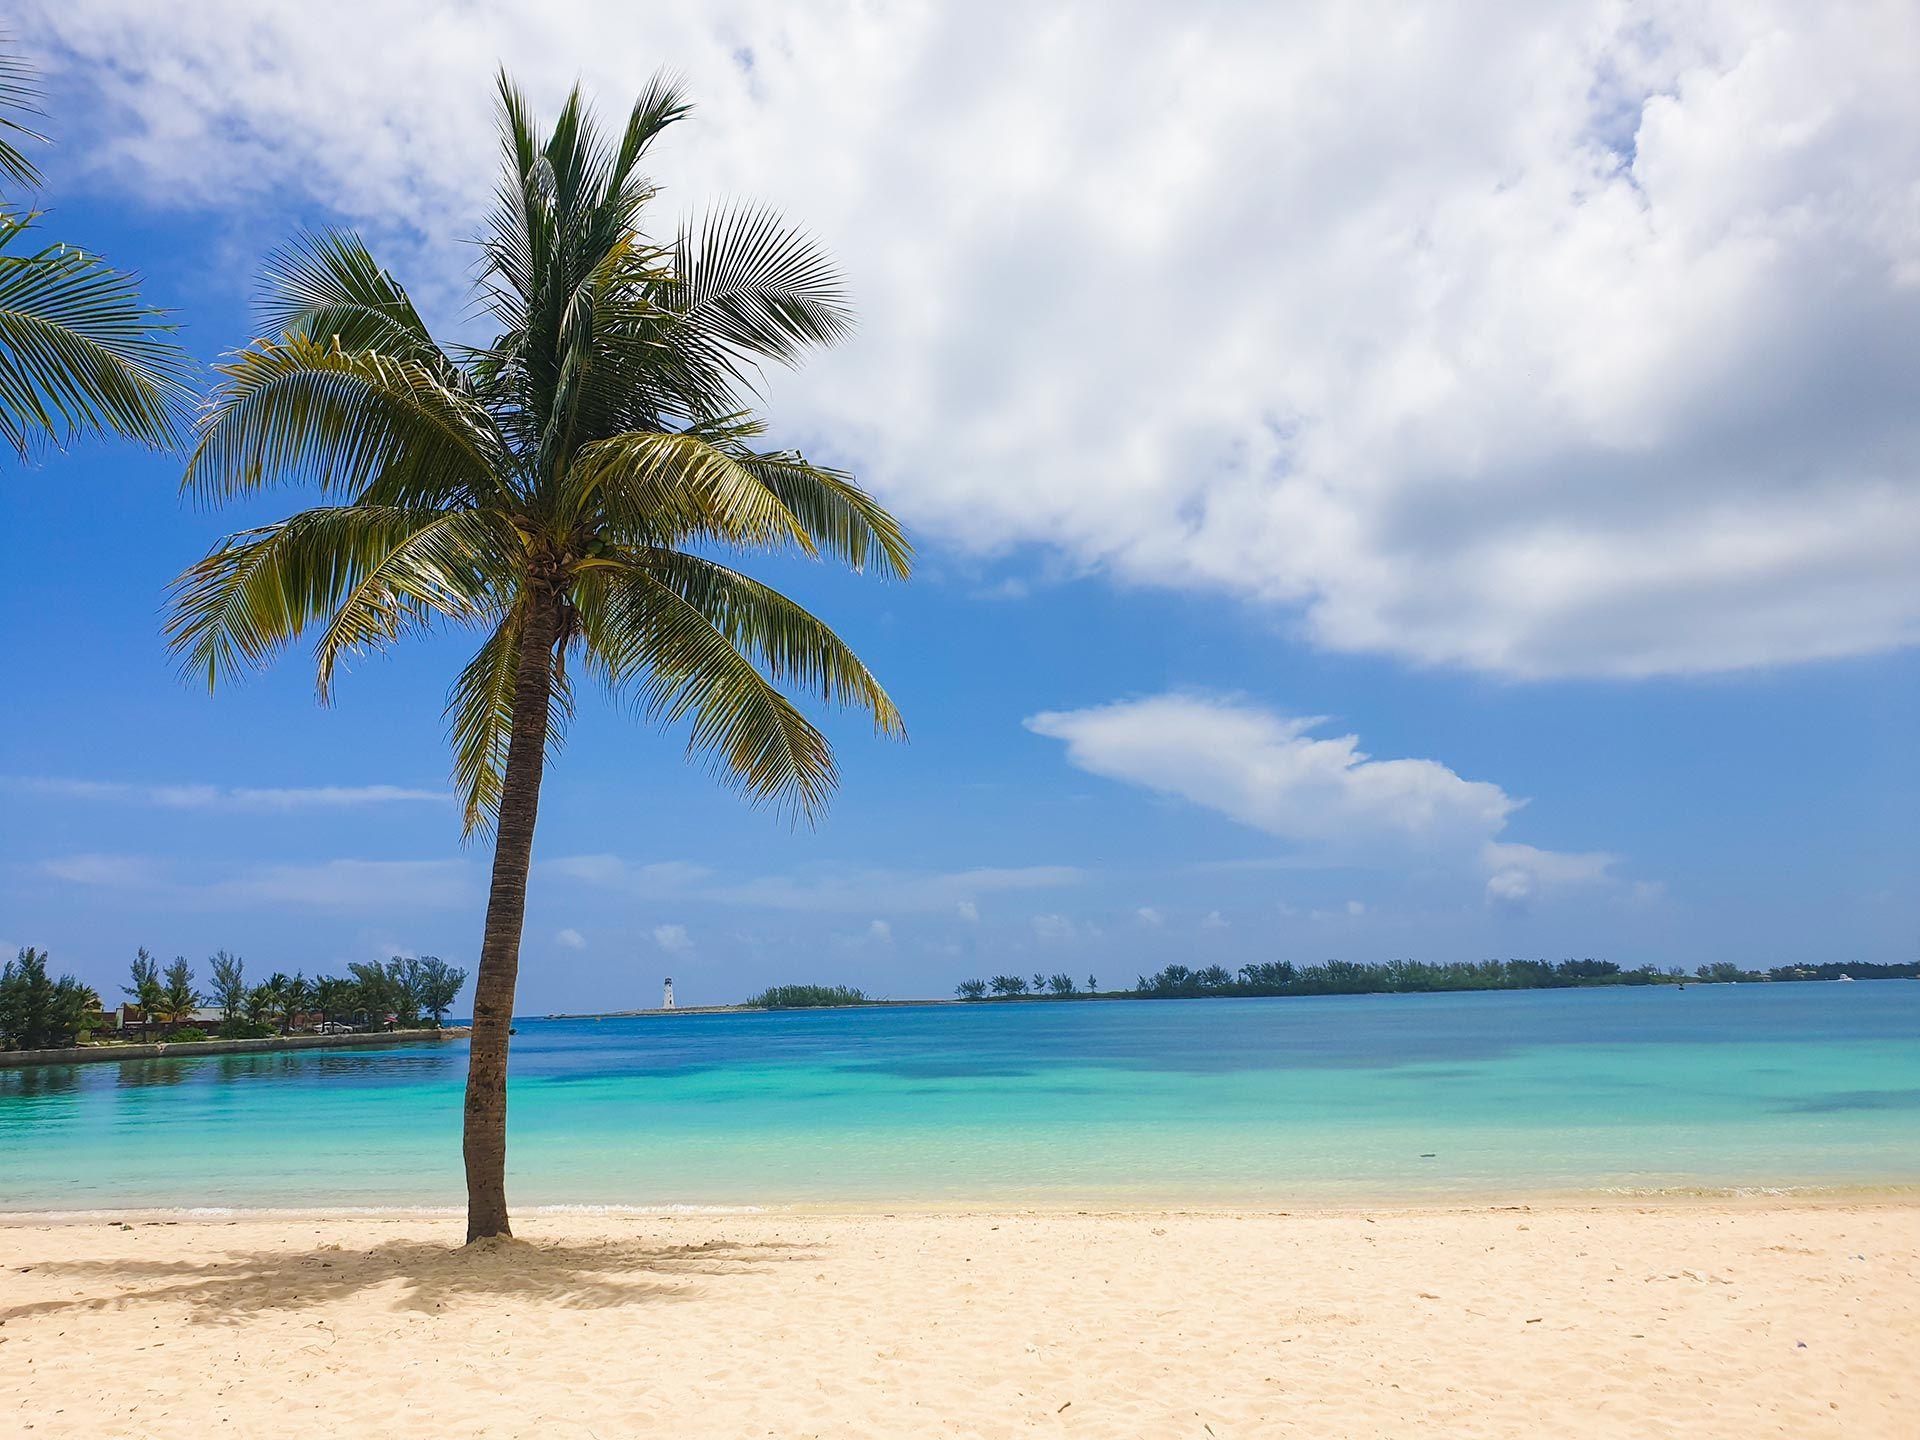 The local scene in nassau, bahamas